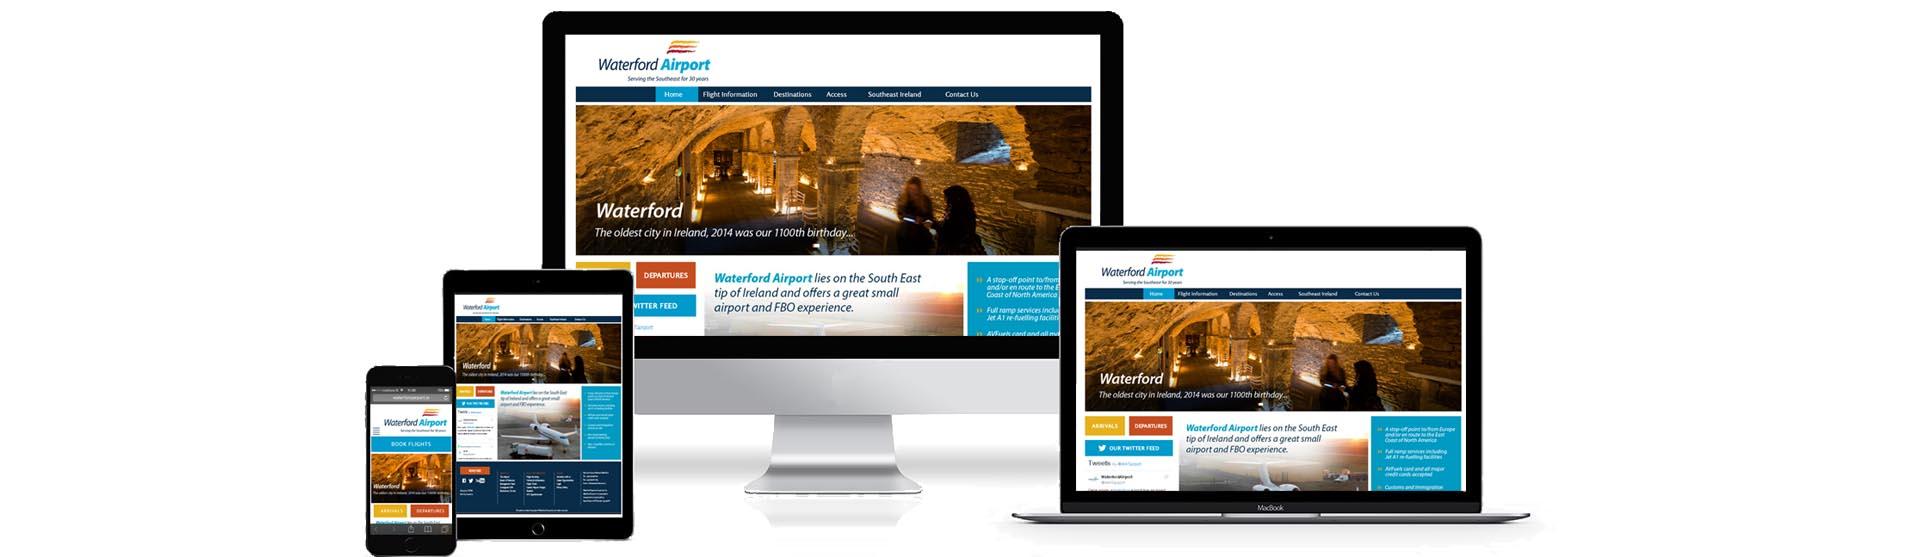 Website Design and Development Waterford - Website Design Company